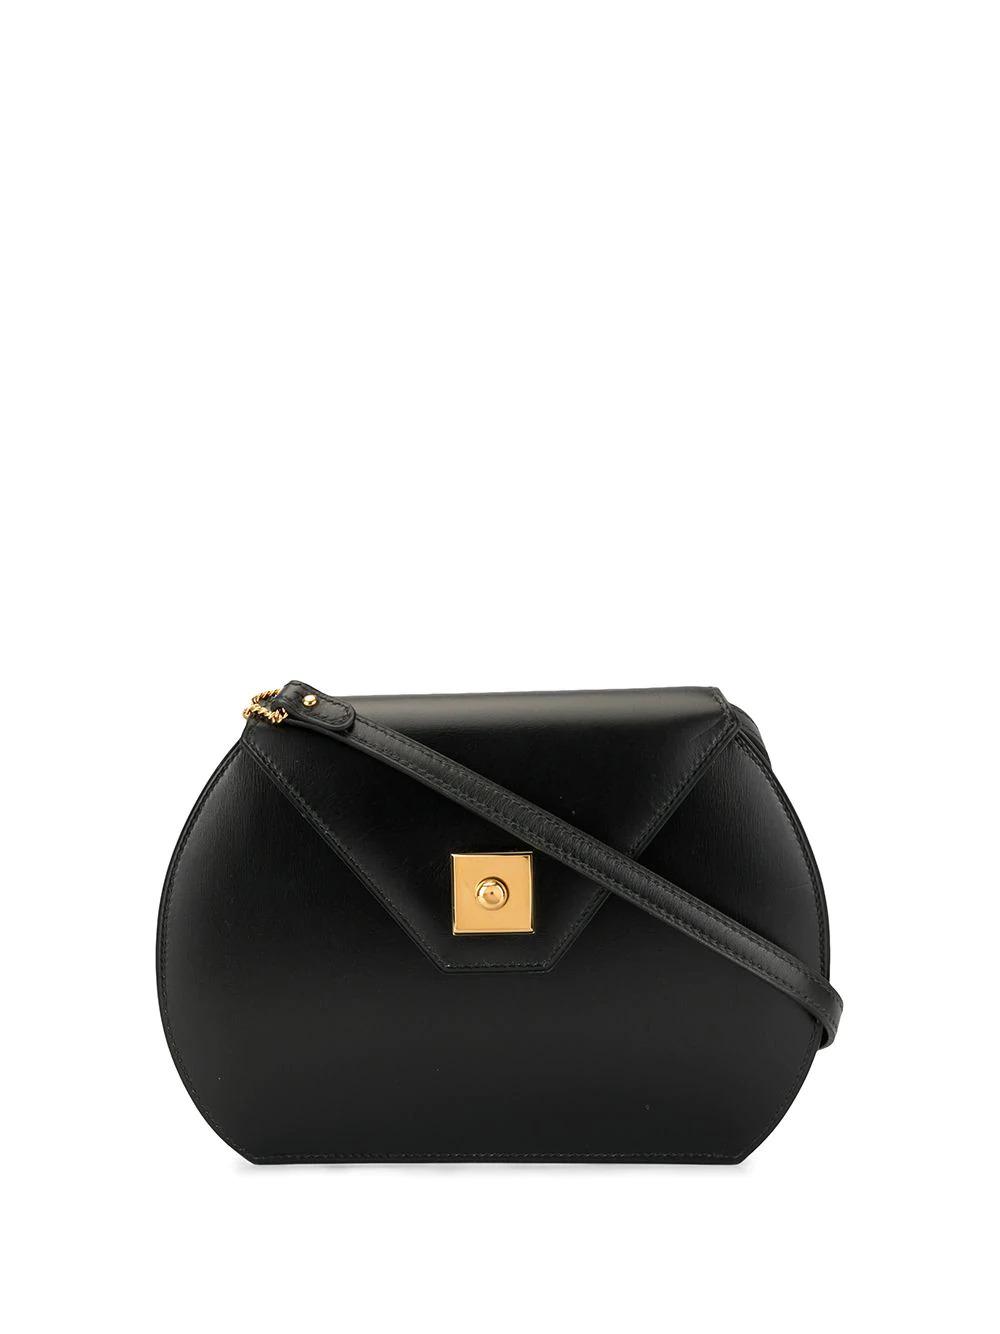 5. Hermès 1993 pre-owned Piano shoulder bag HK$30,619